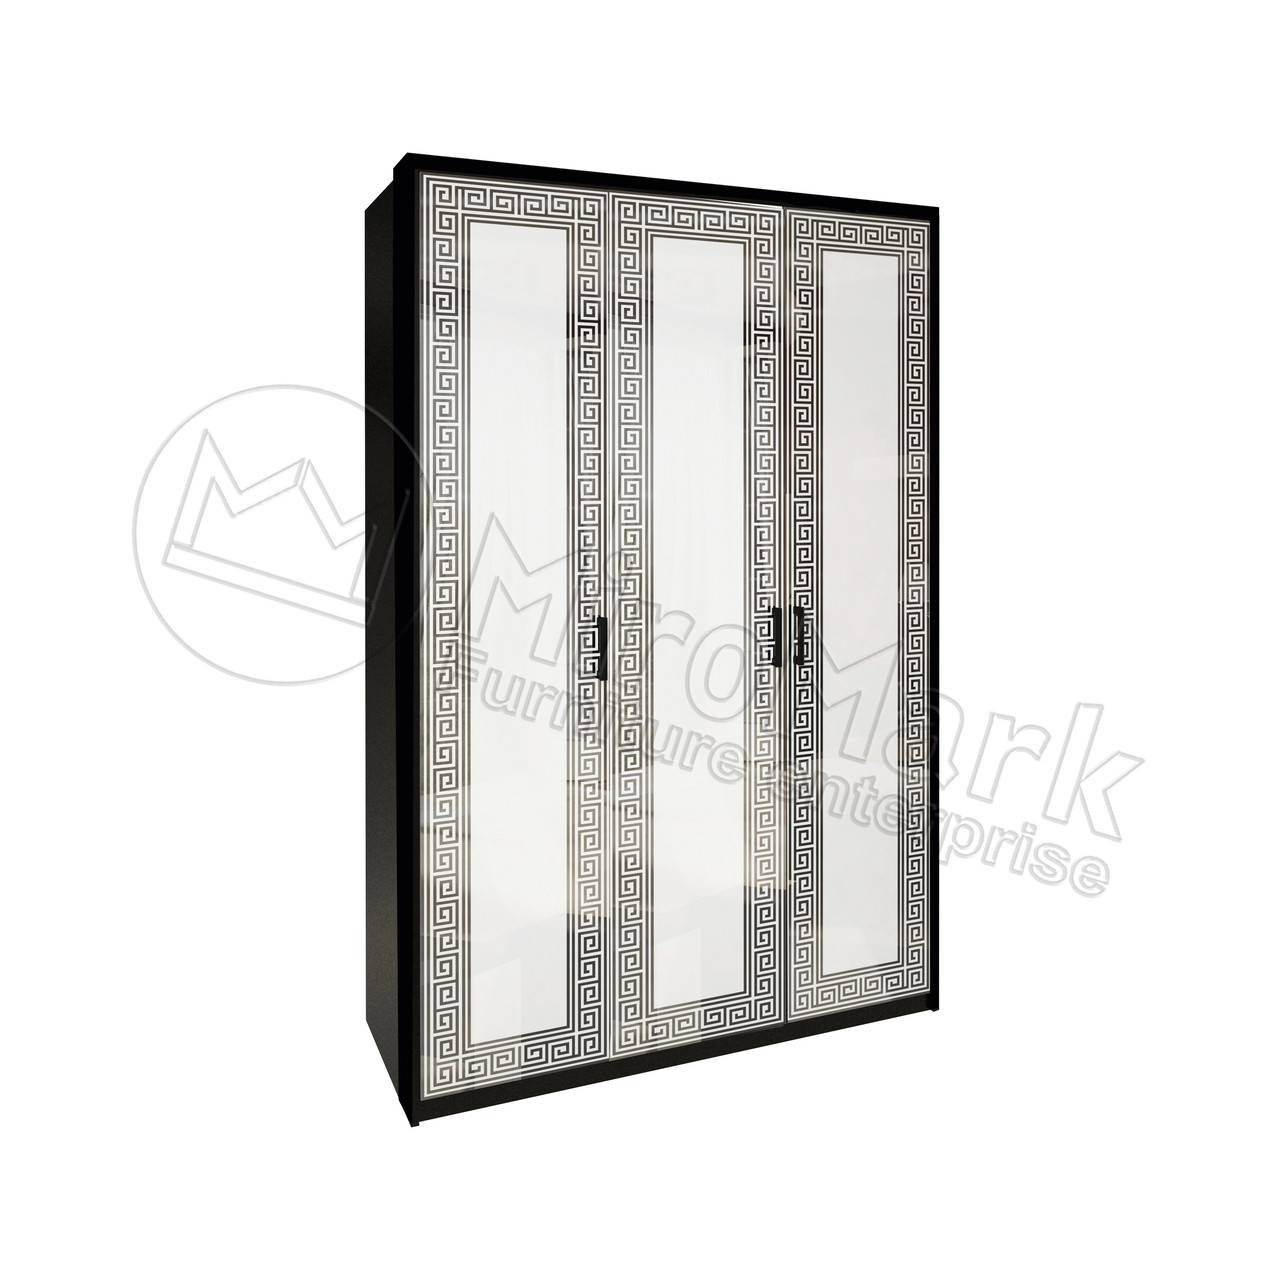 Шкаф 3дв Виола глянец белый-черный мат без зеркал ТМ Миро Марк